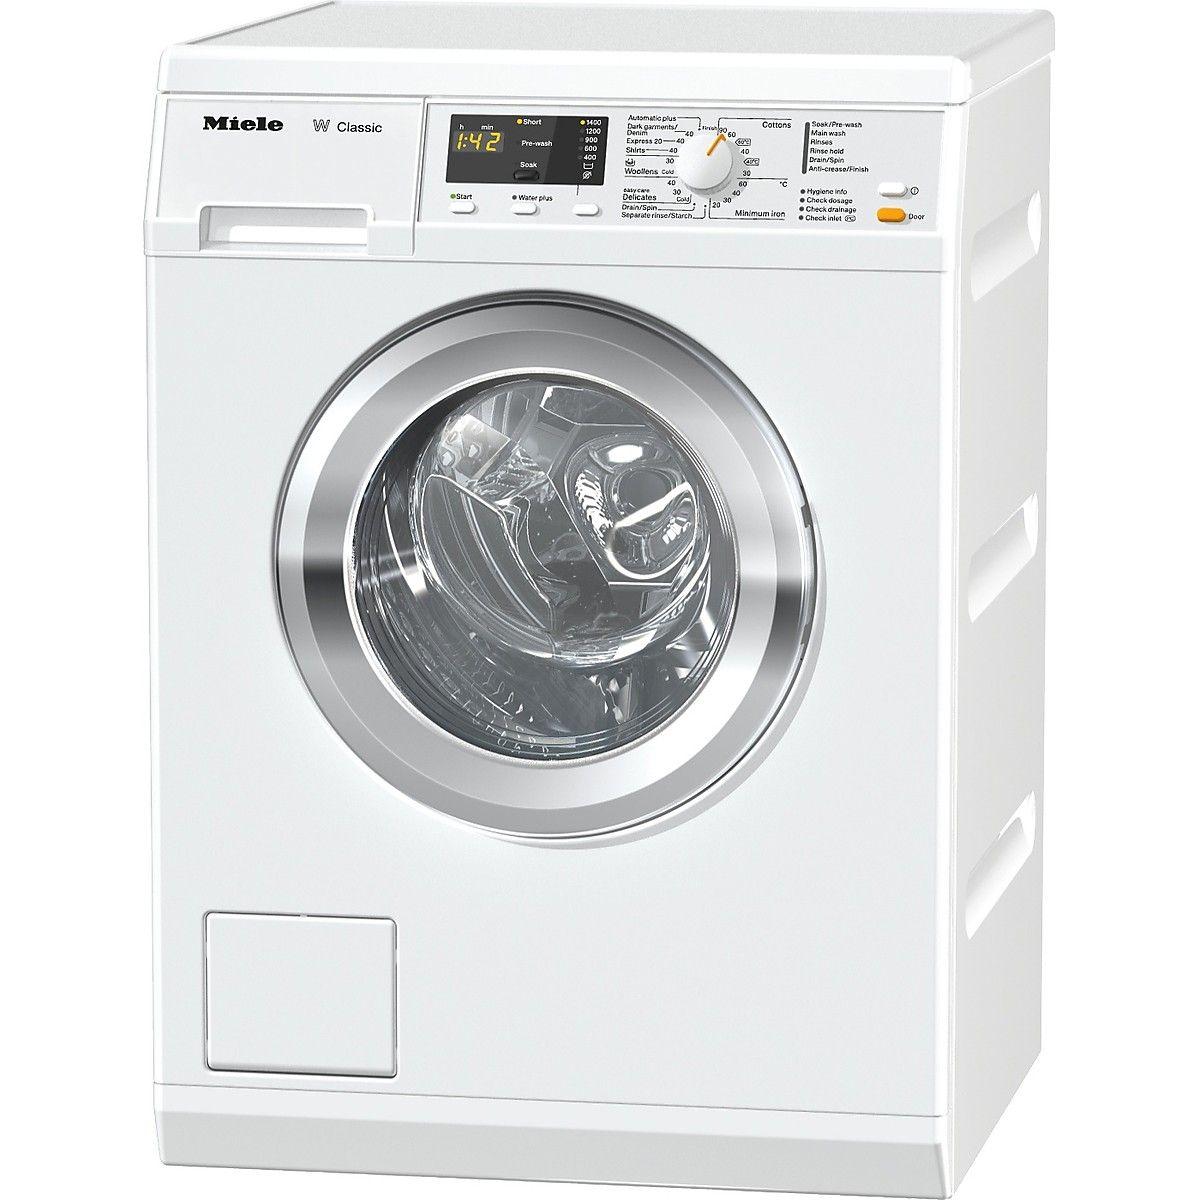 Pin On Miele Home Appliances